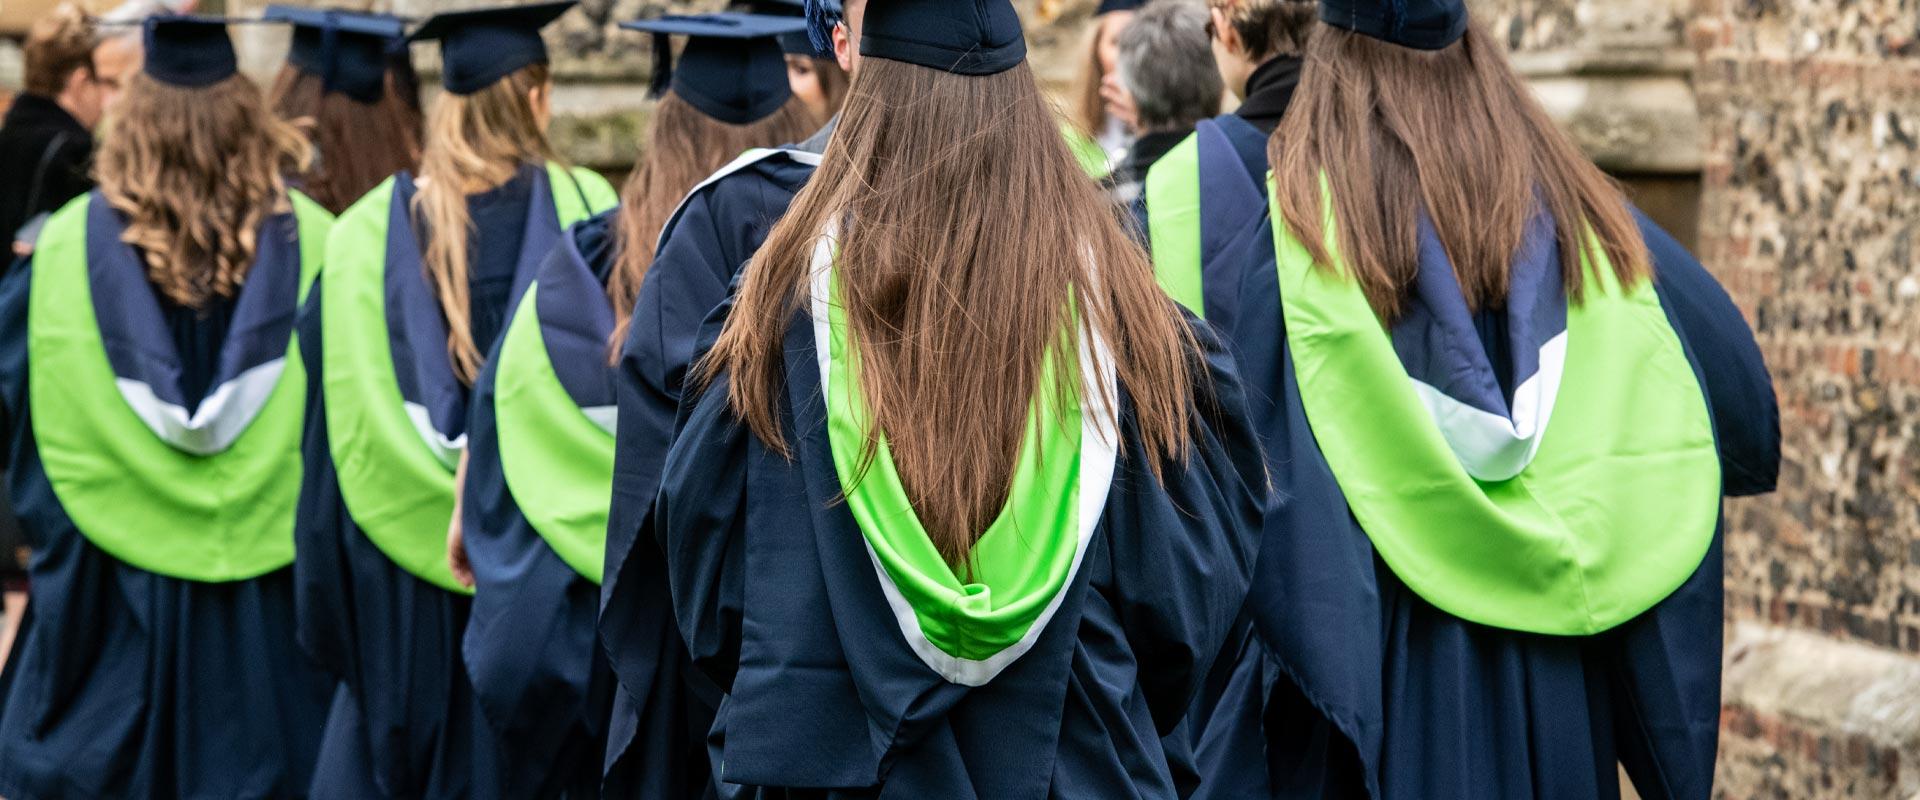 Graduation Robe Hire Writtle University College